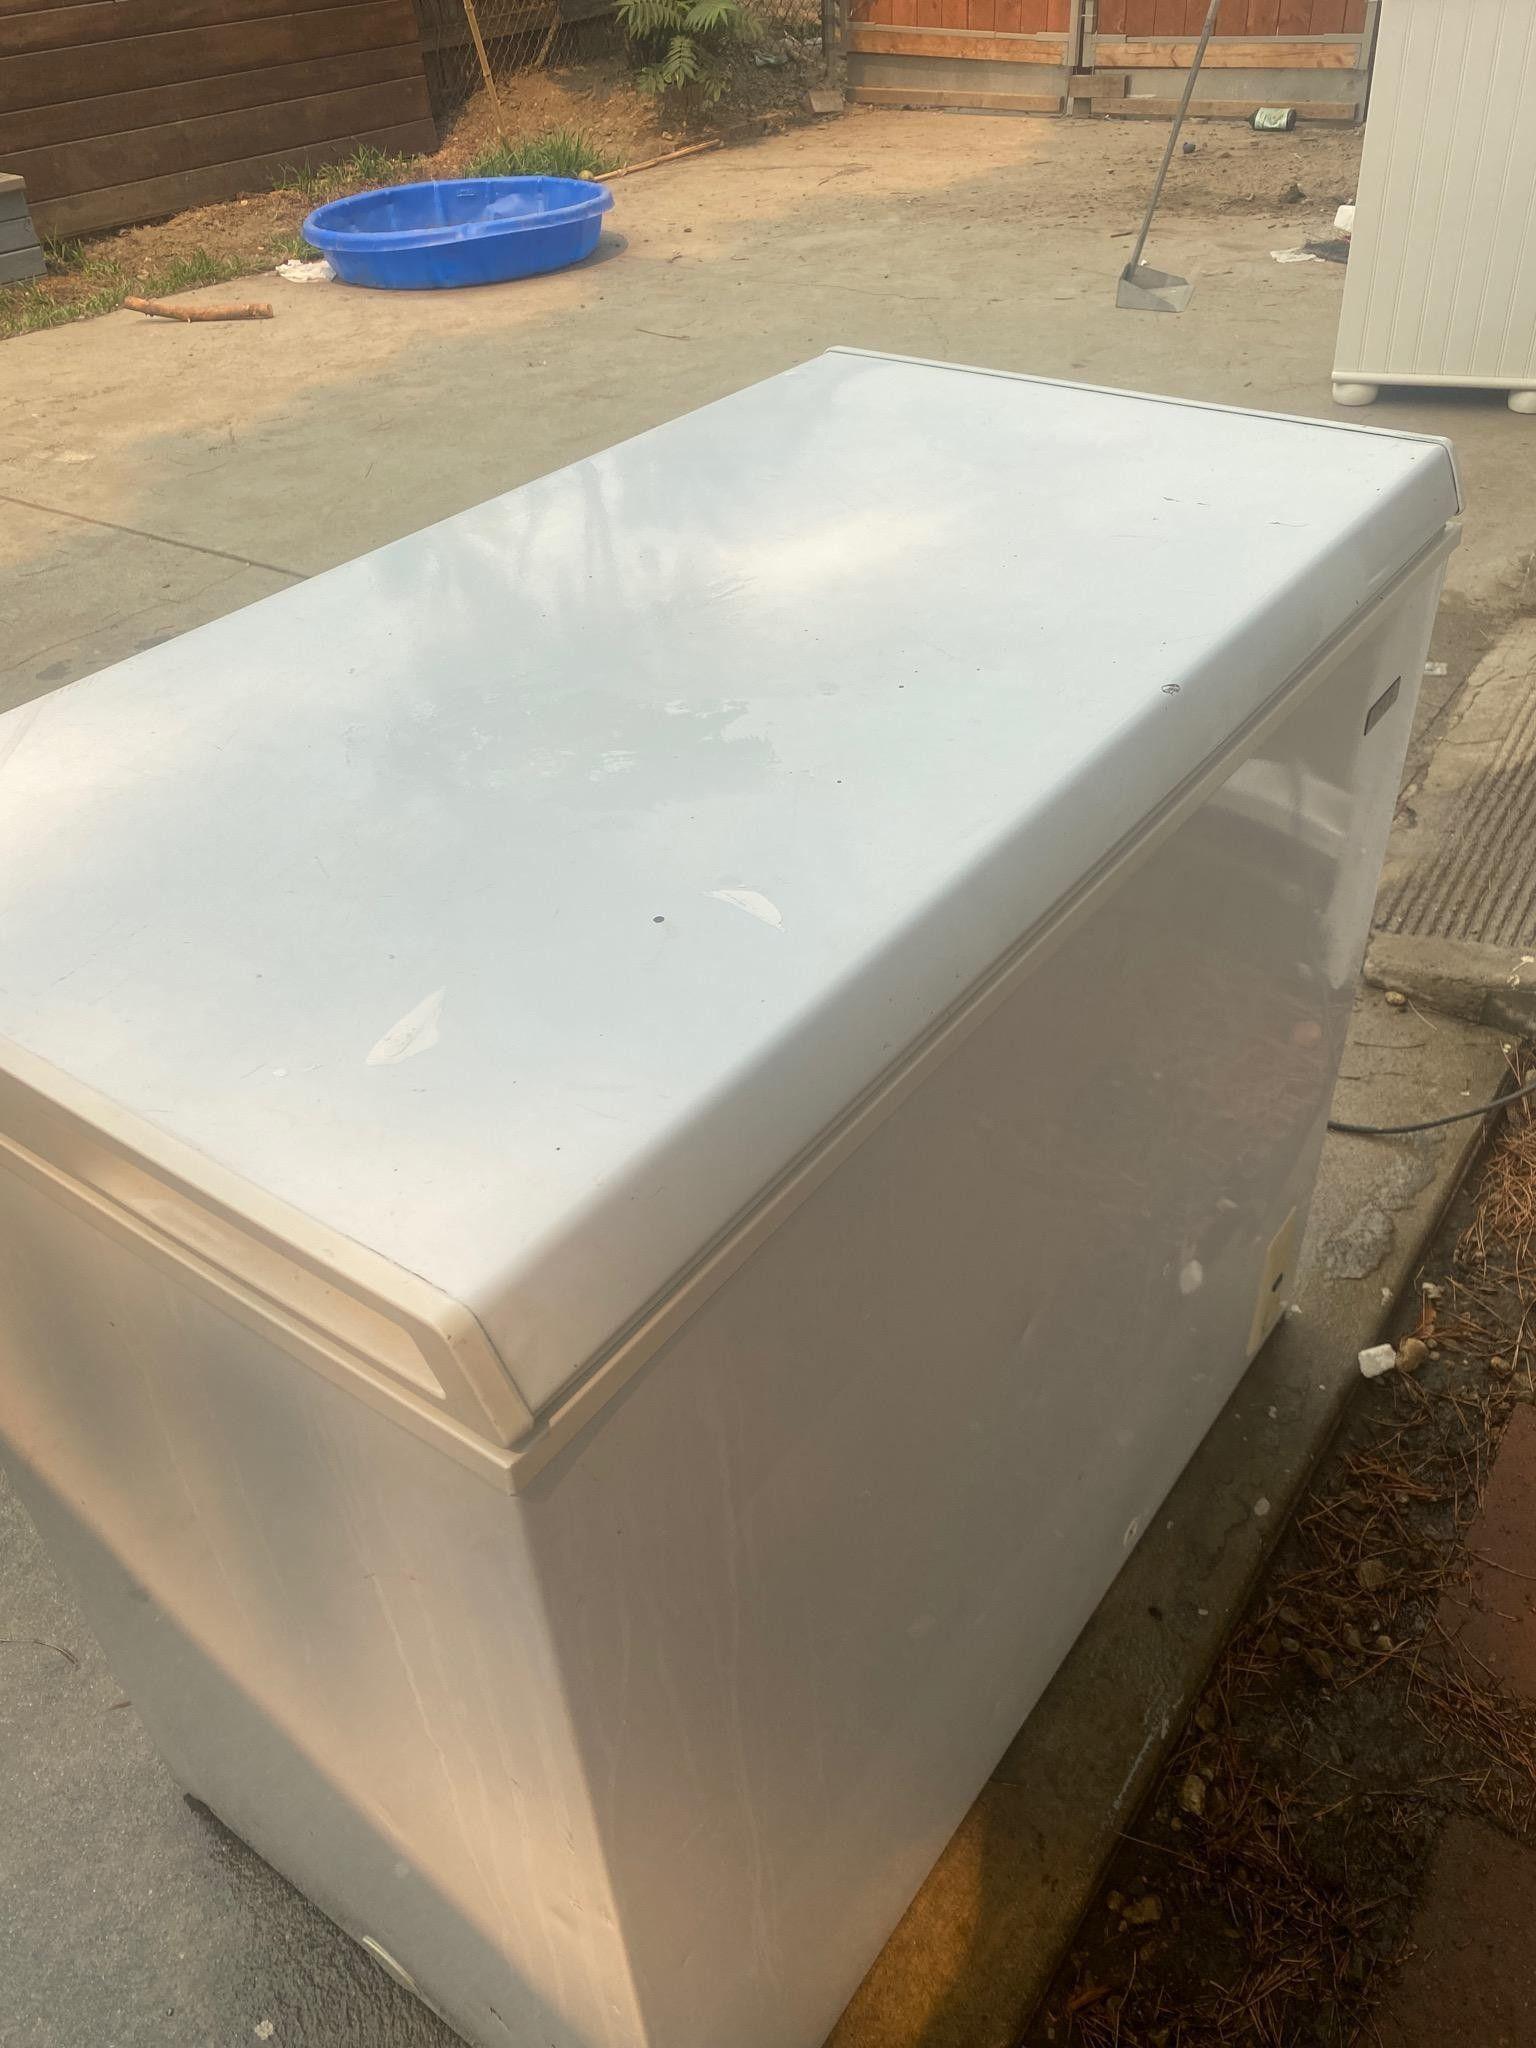 Idylis 7.0 cu. Ft chest freezer